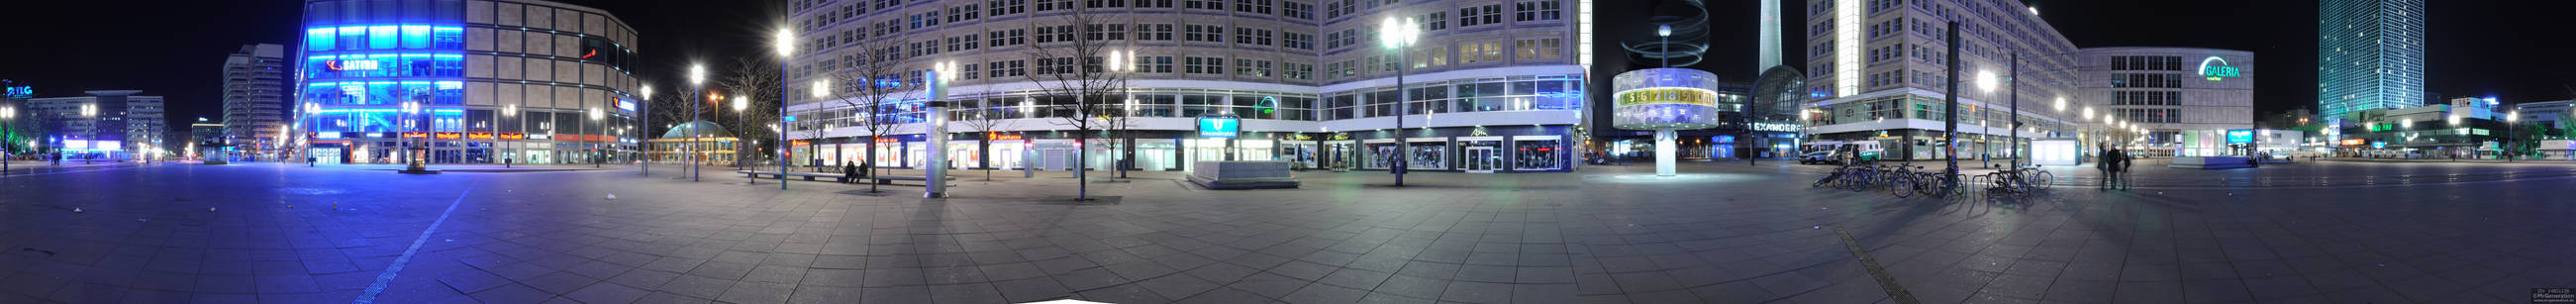 Berlin Alexanderplatz Panorama